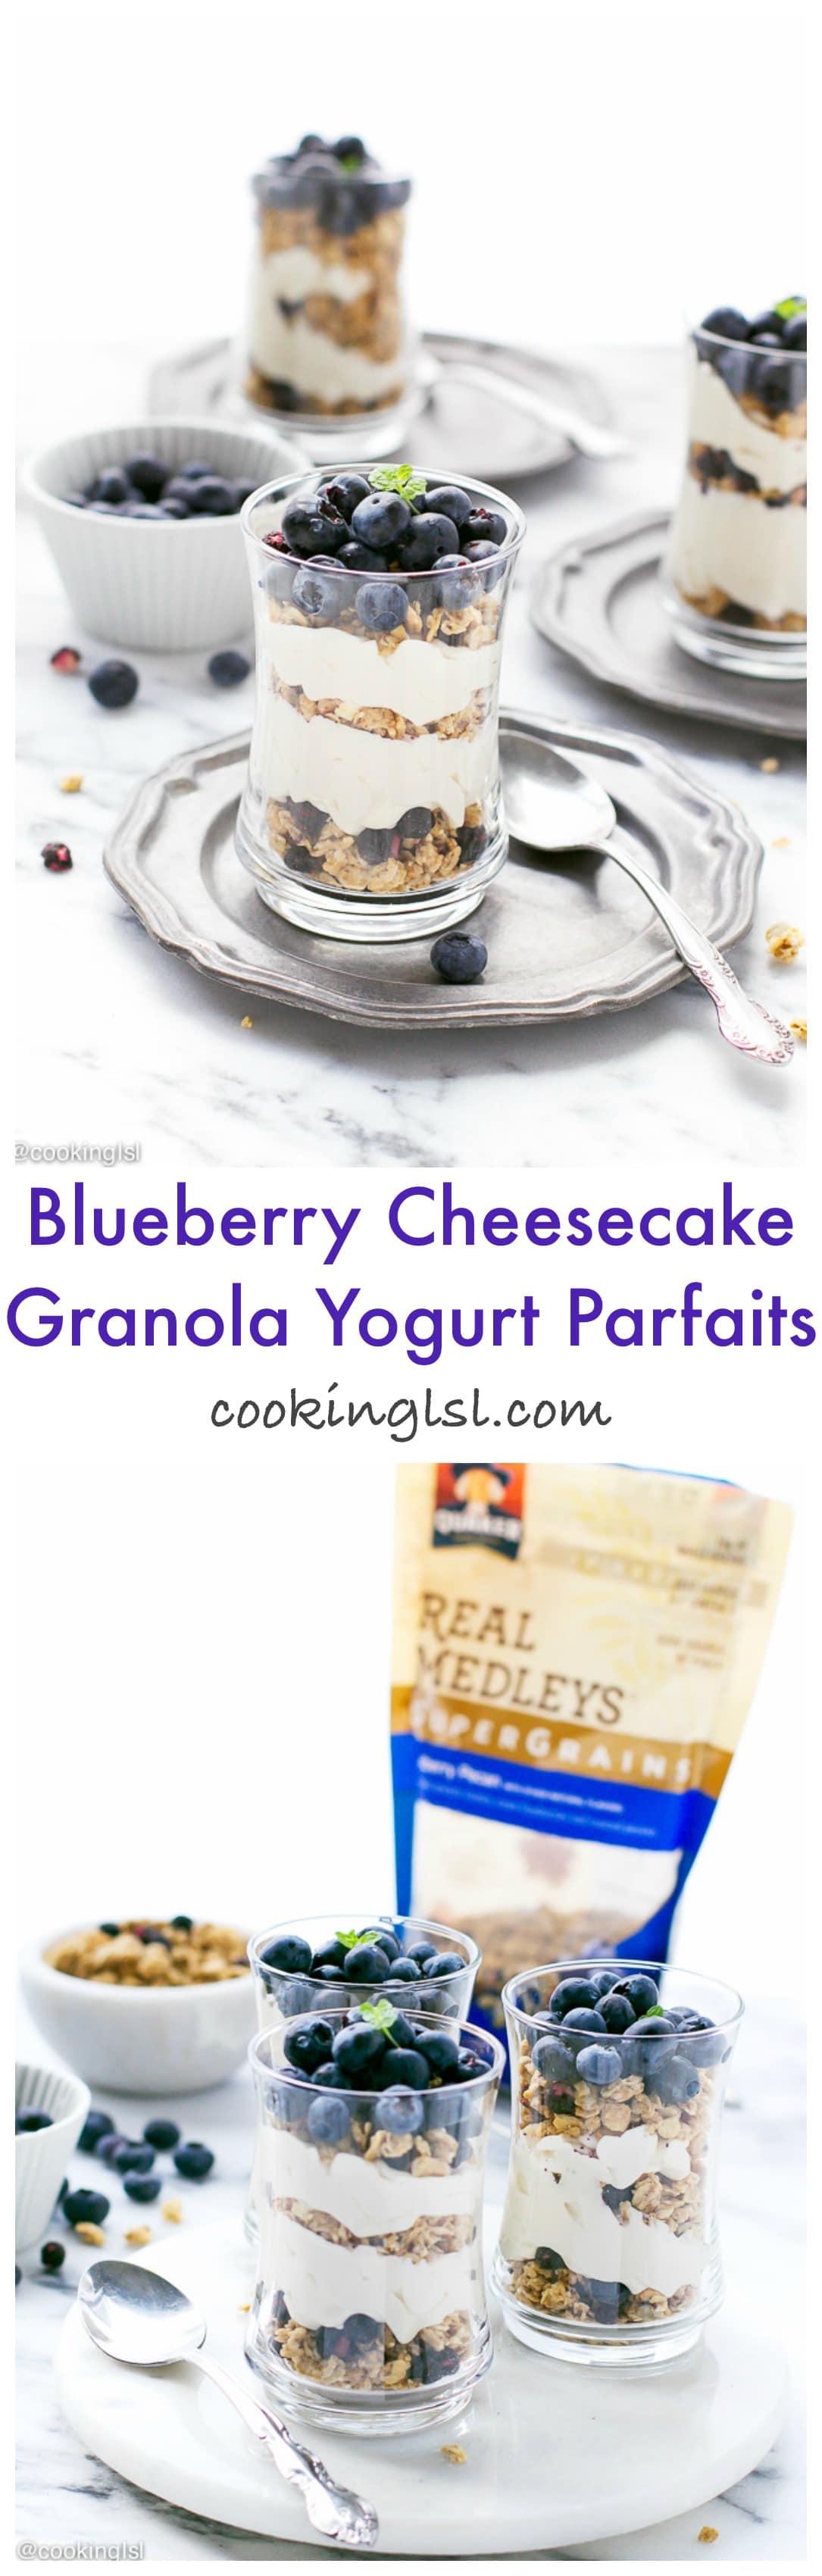 blueberry-granola-cheesecake-parfait-quaker-real-medley